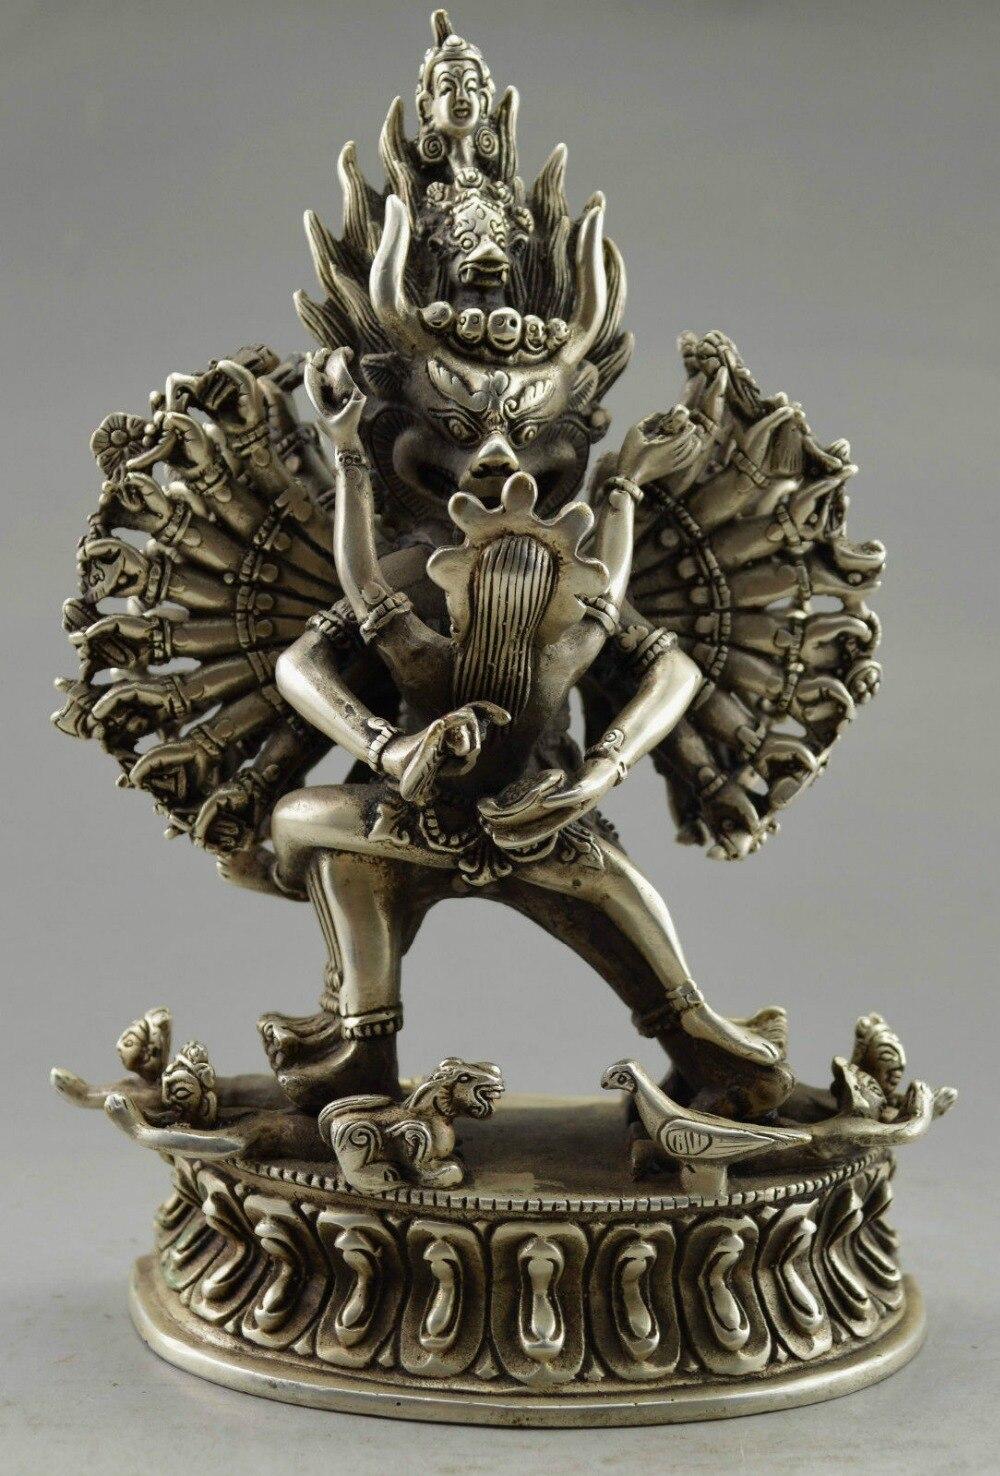 Elaborate Collectible Decorated Old Handwork Tibetan Silver Yamantaka Buddha Statue sculptureElaborate Collectible Decorated Old Handwork Tibetan Silver Yamantaka Buddha Statue sculpture